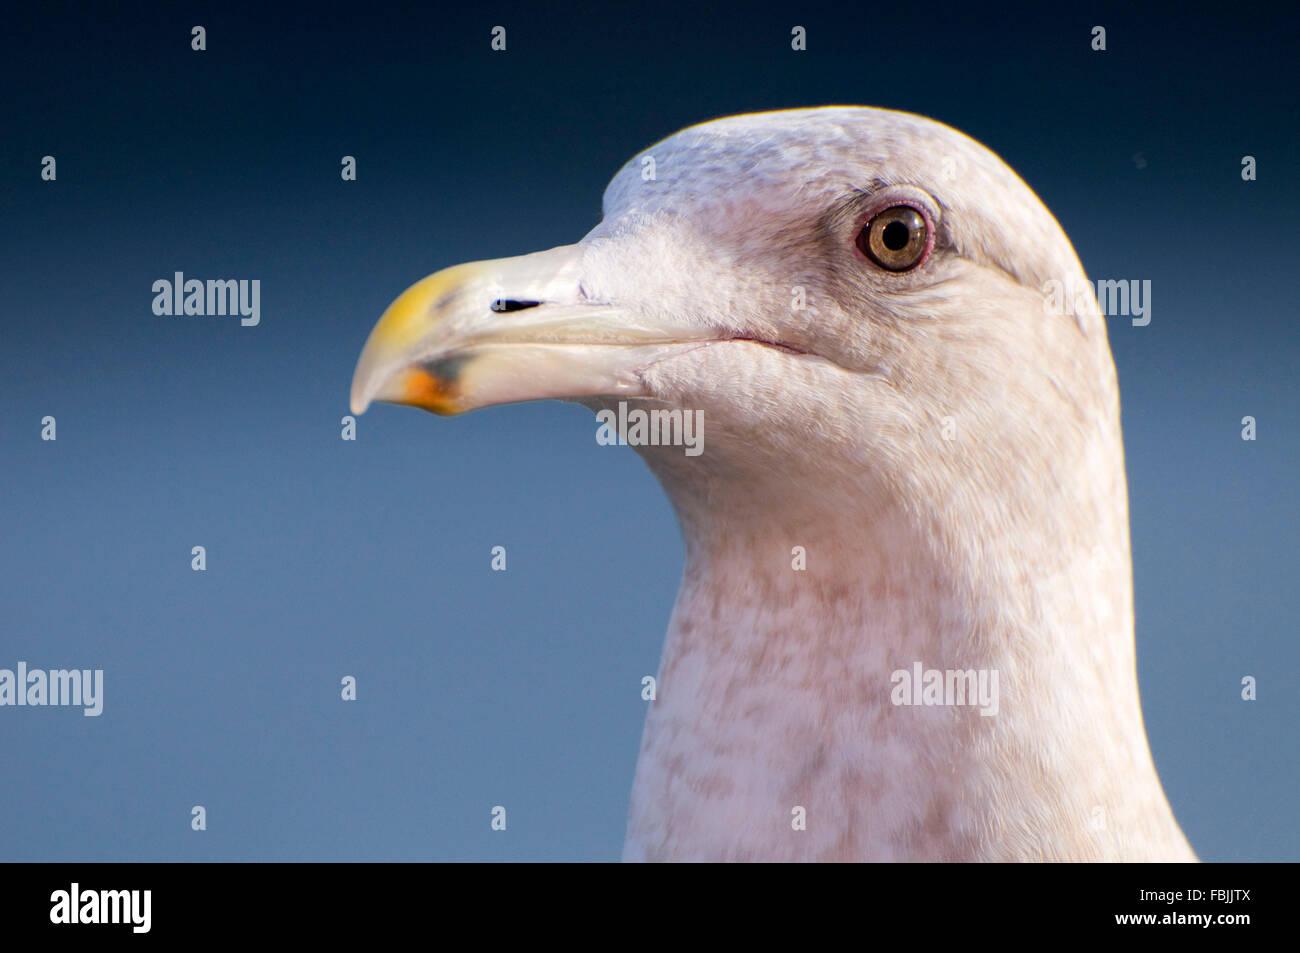 Glaucous-winged gull (Larus glaucescens), Waterfront Park, Portland, Oregon - Stock Image